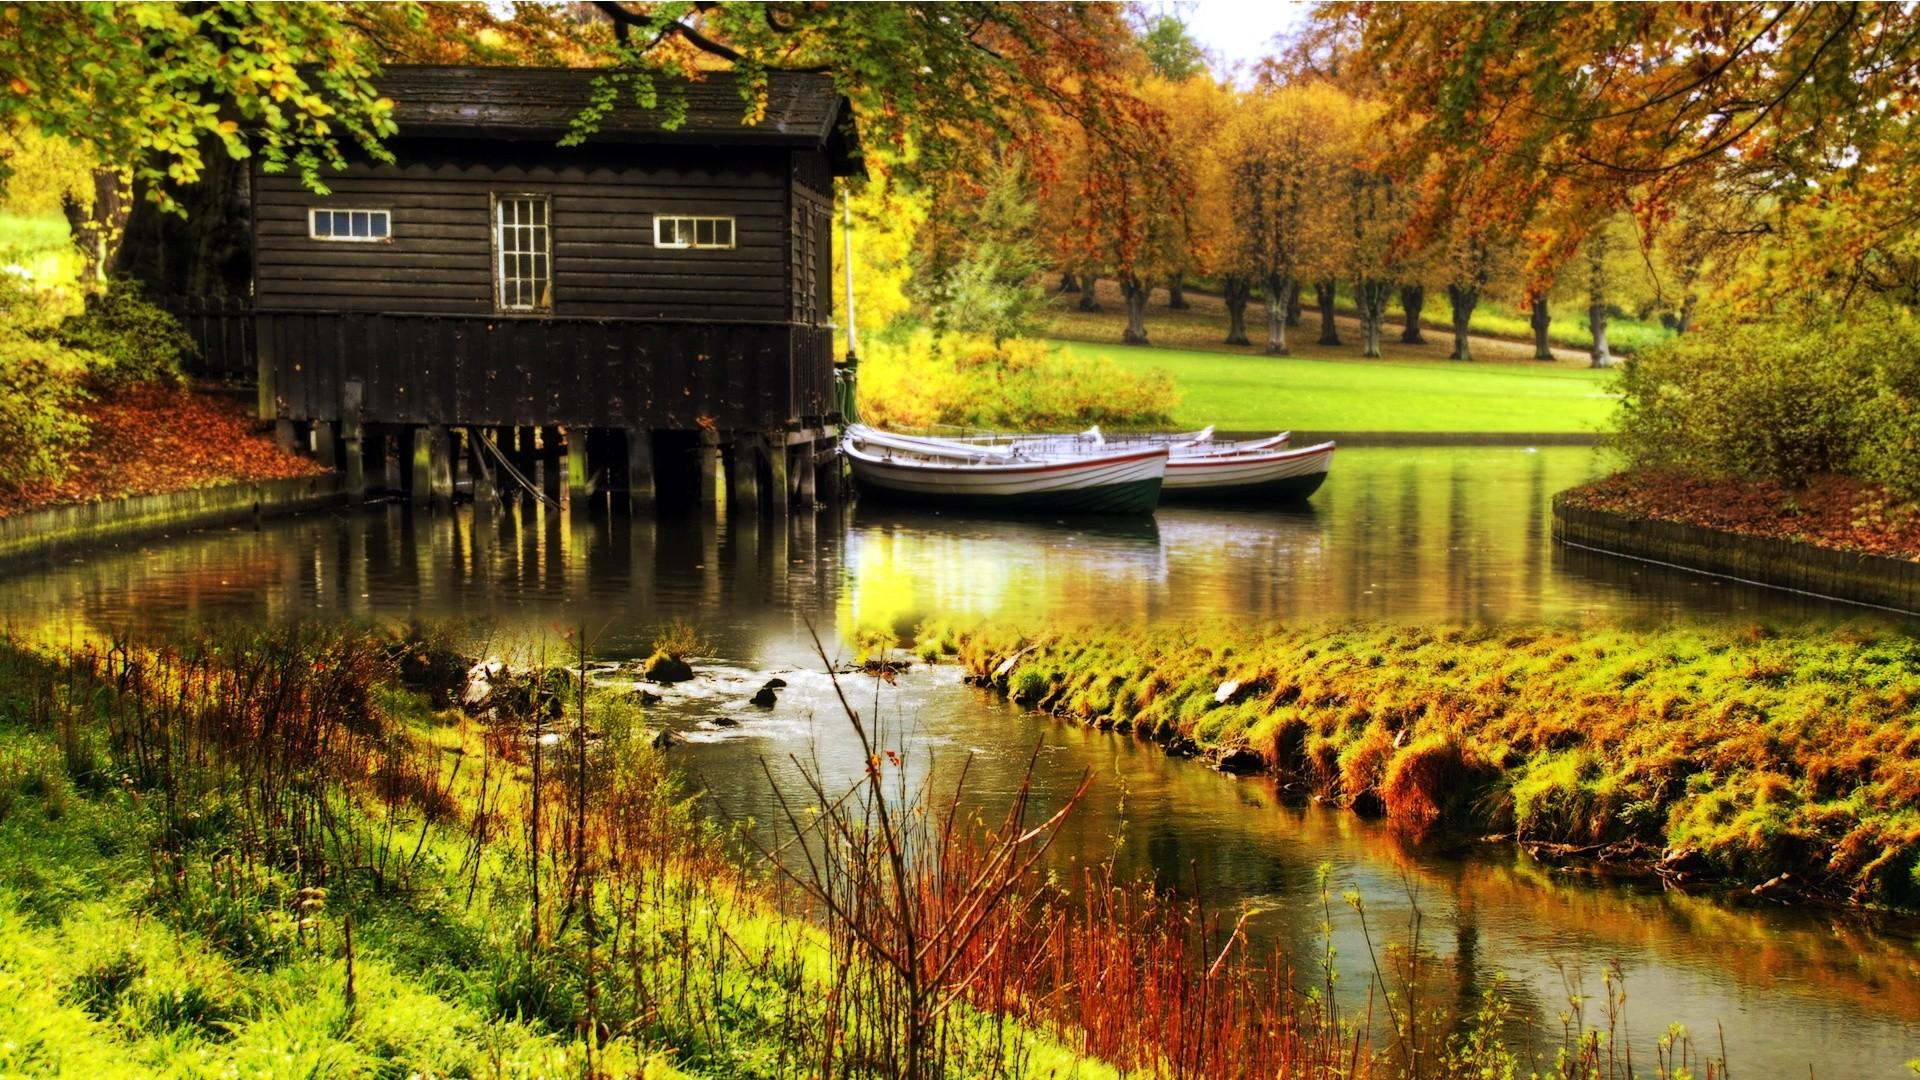 HD Wallpapers Widescreen 1080P 3D | … full hd wallpapers best  nature full